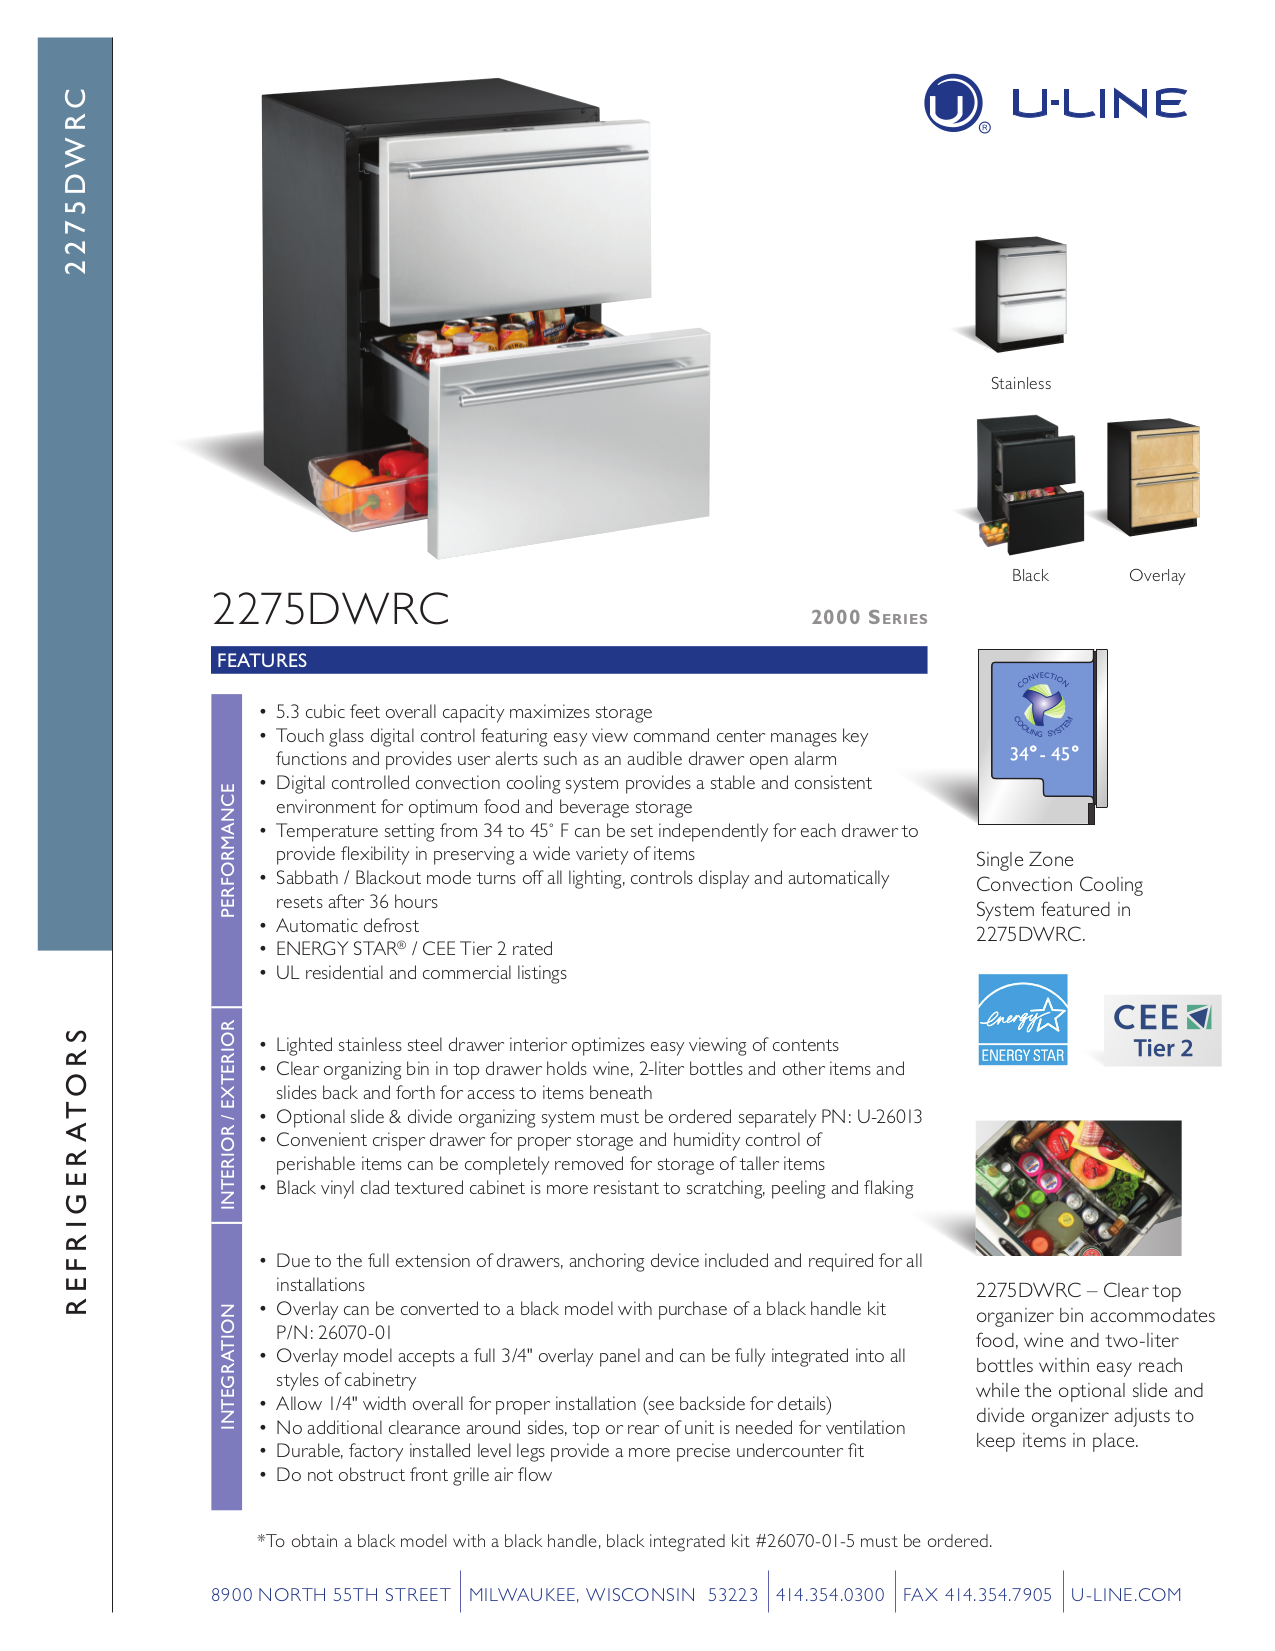 pdf for U-Line Refrigerator 2275DWRCS-00 manual